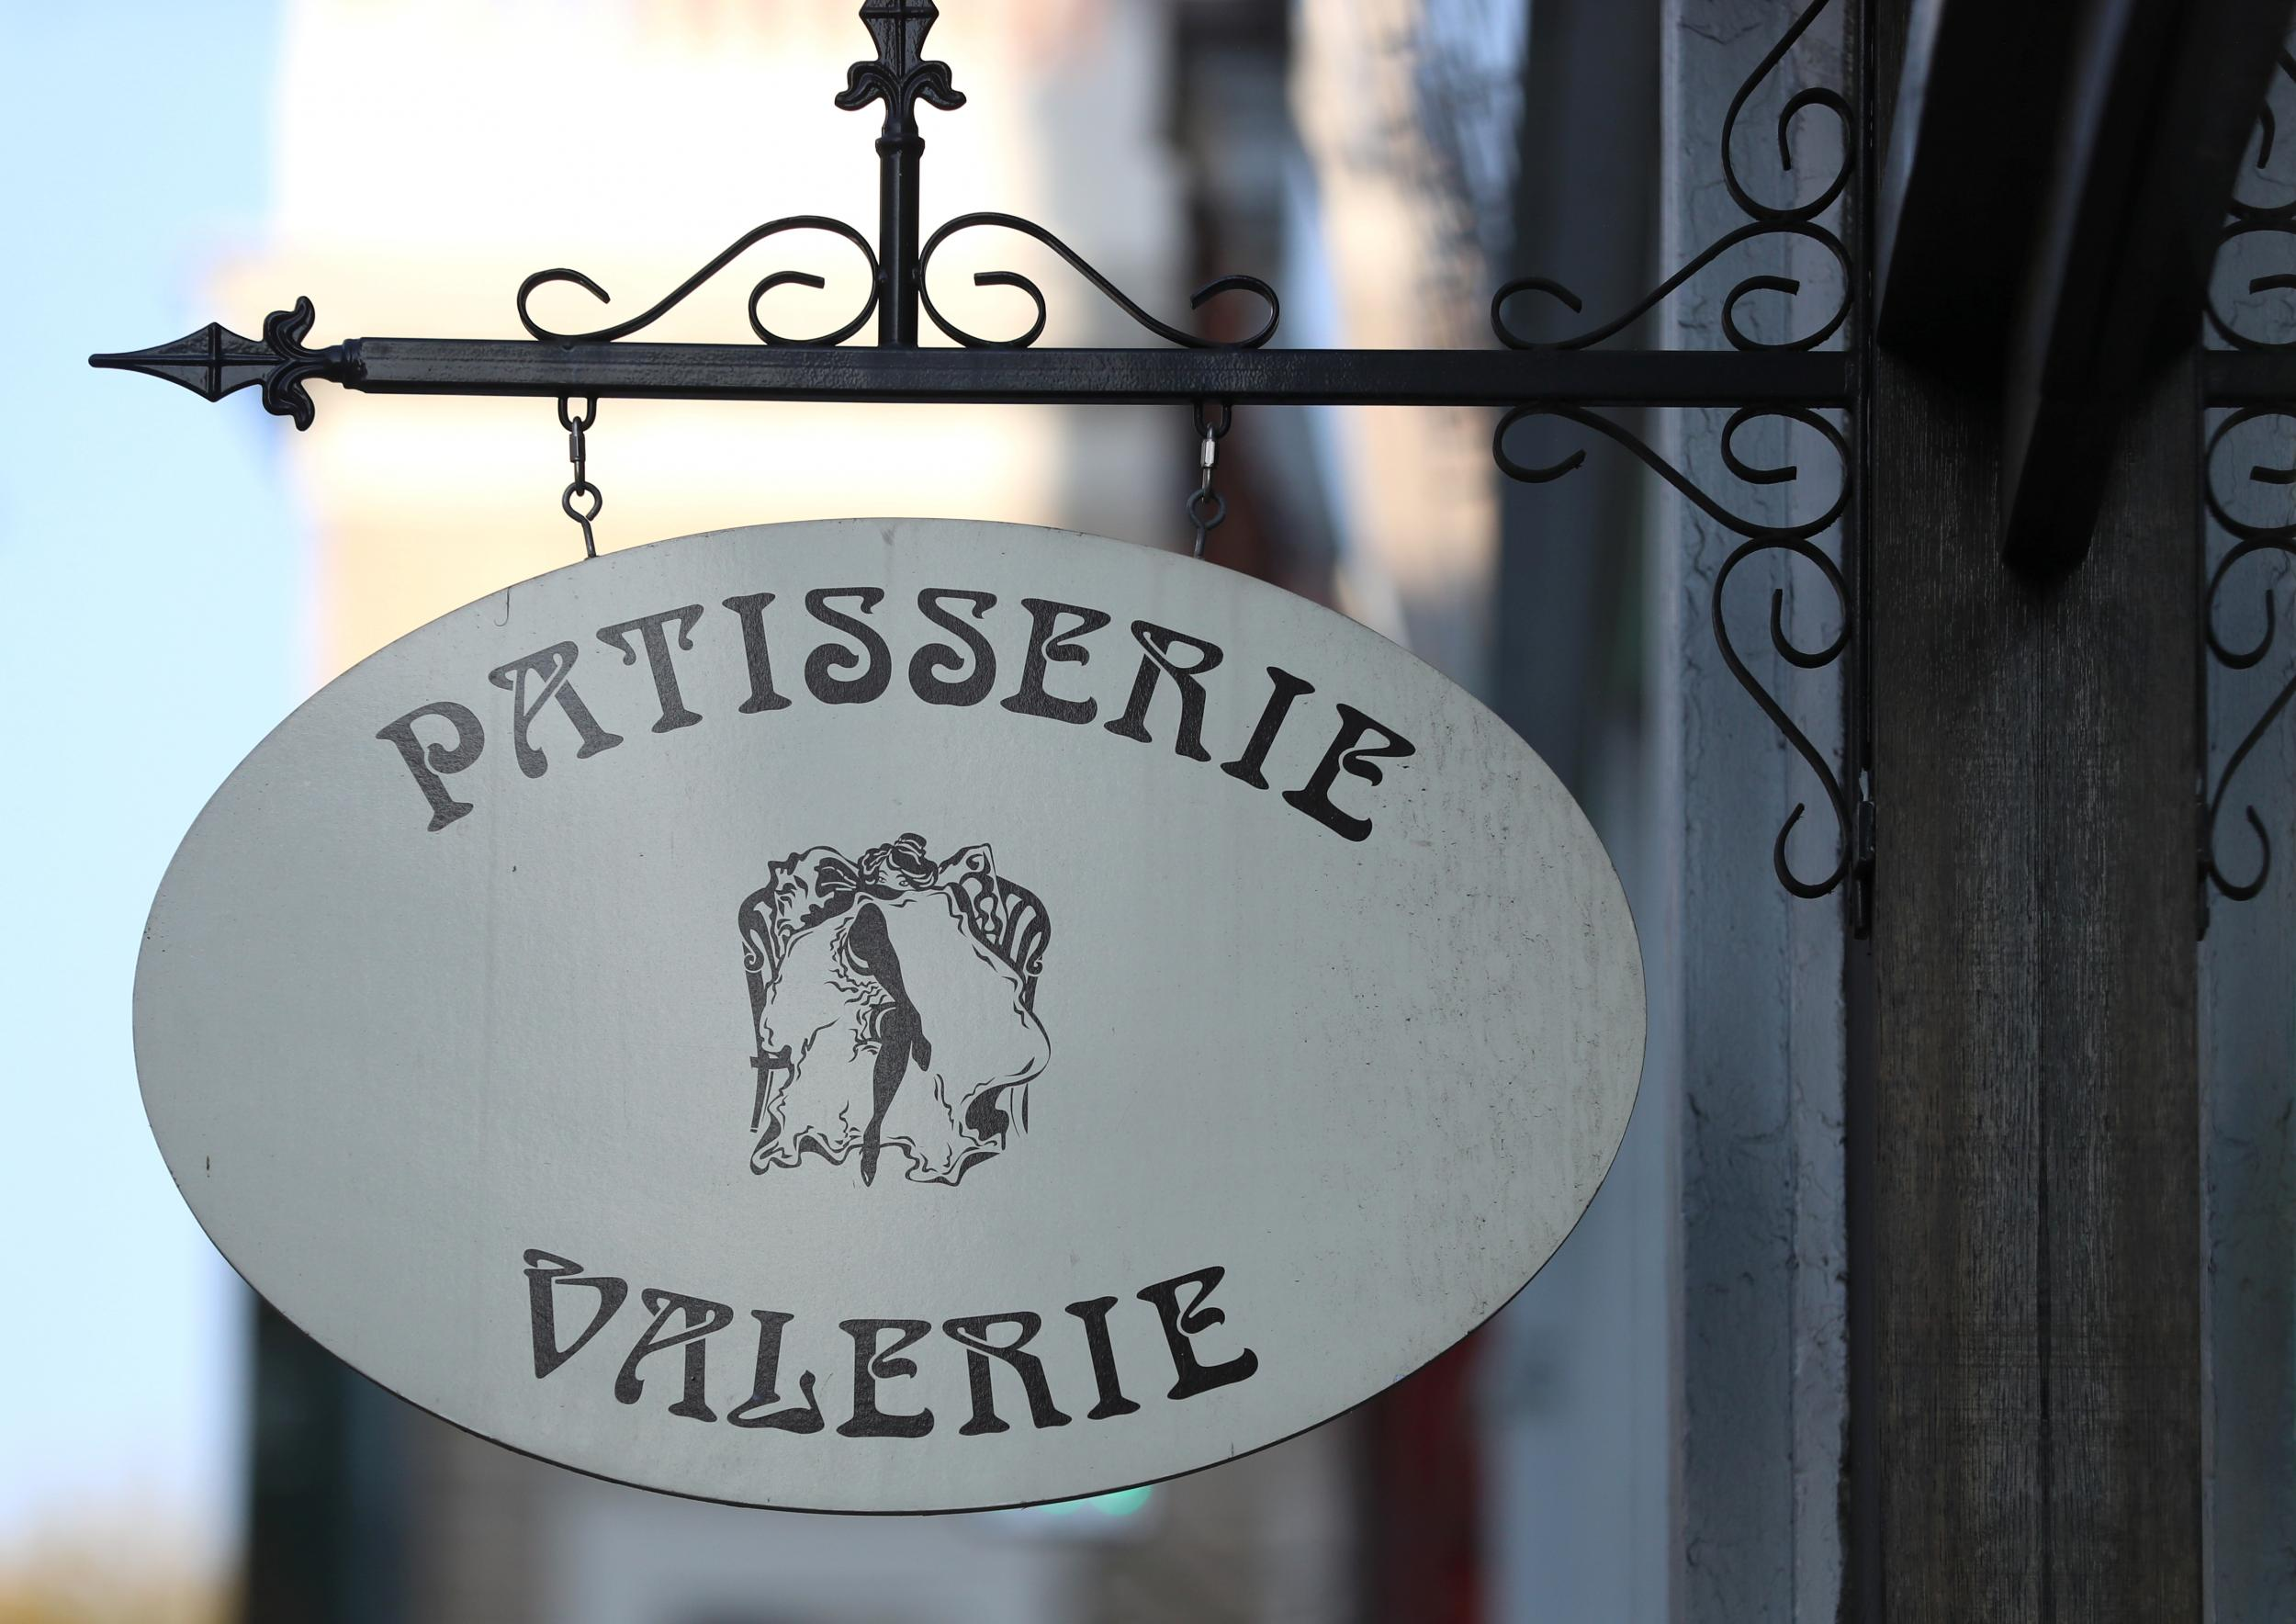 Patisserie Valerie faces closure as financial crisis deepens